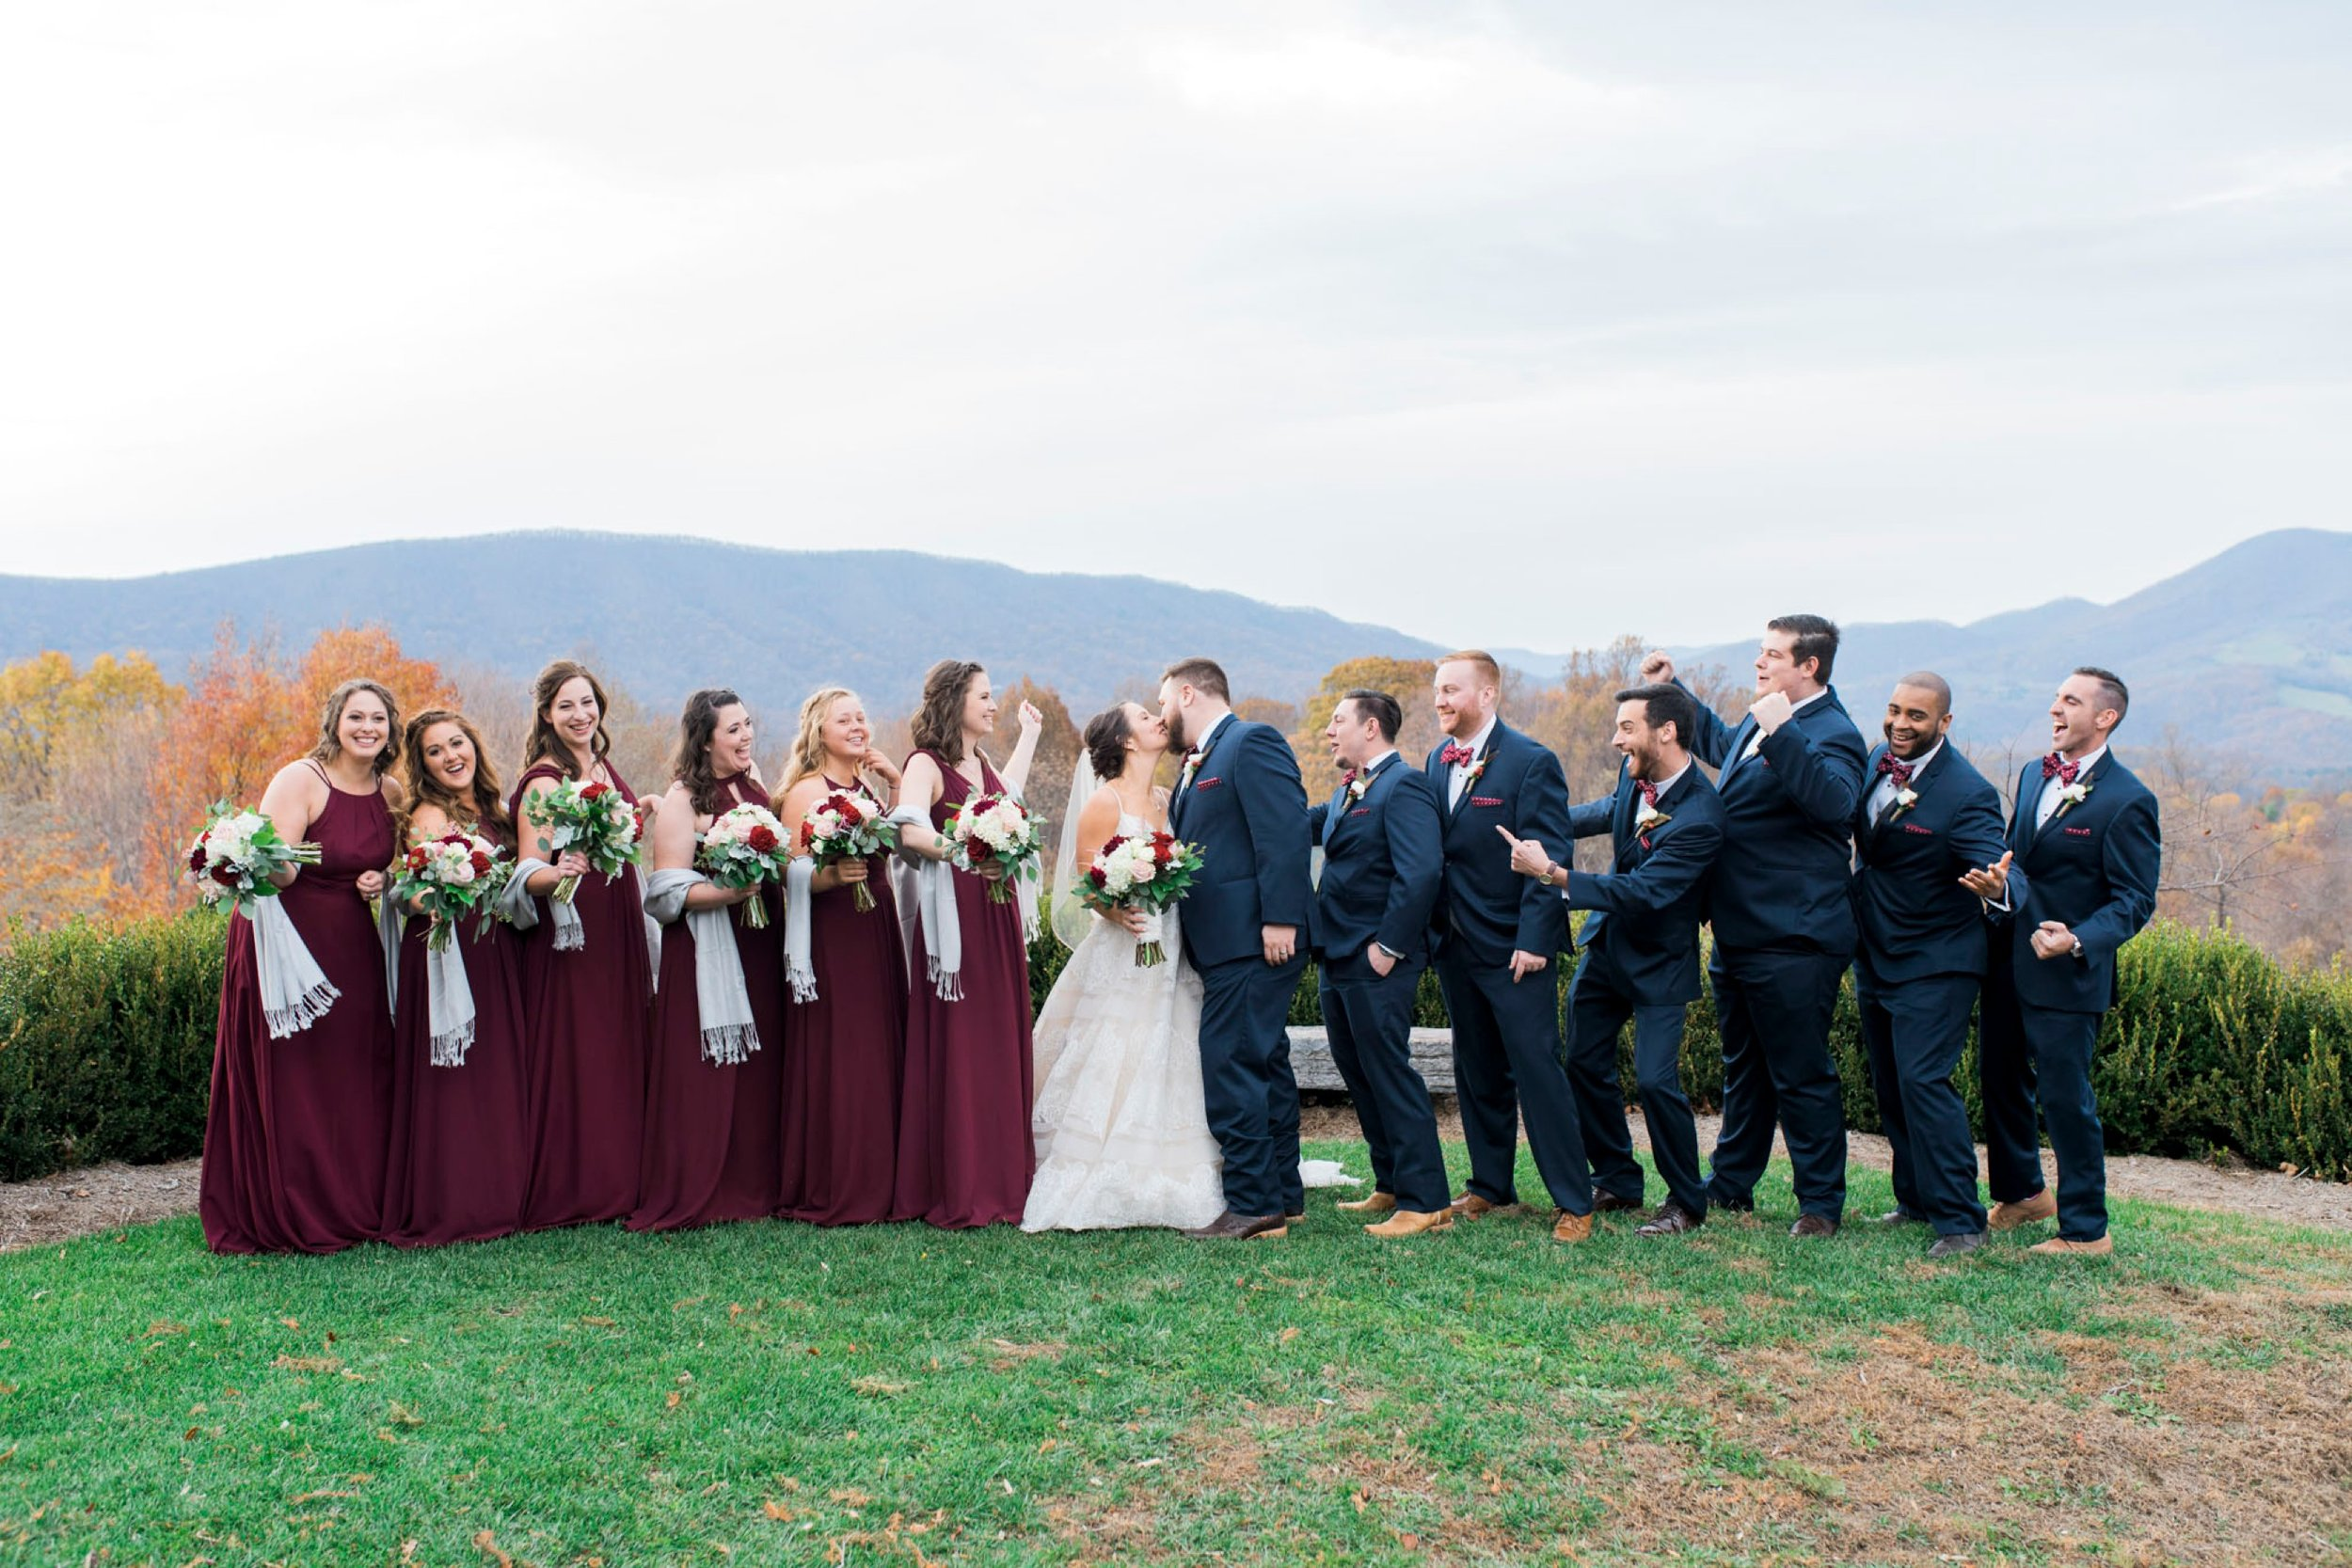 IrvineEstate_LexingtonVA_Wedding_FallWedding_VirginiaWeddingPhotographer 69.jpg